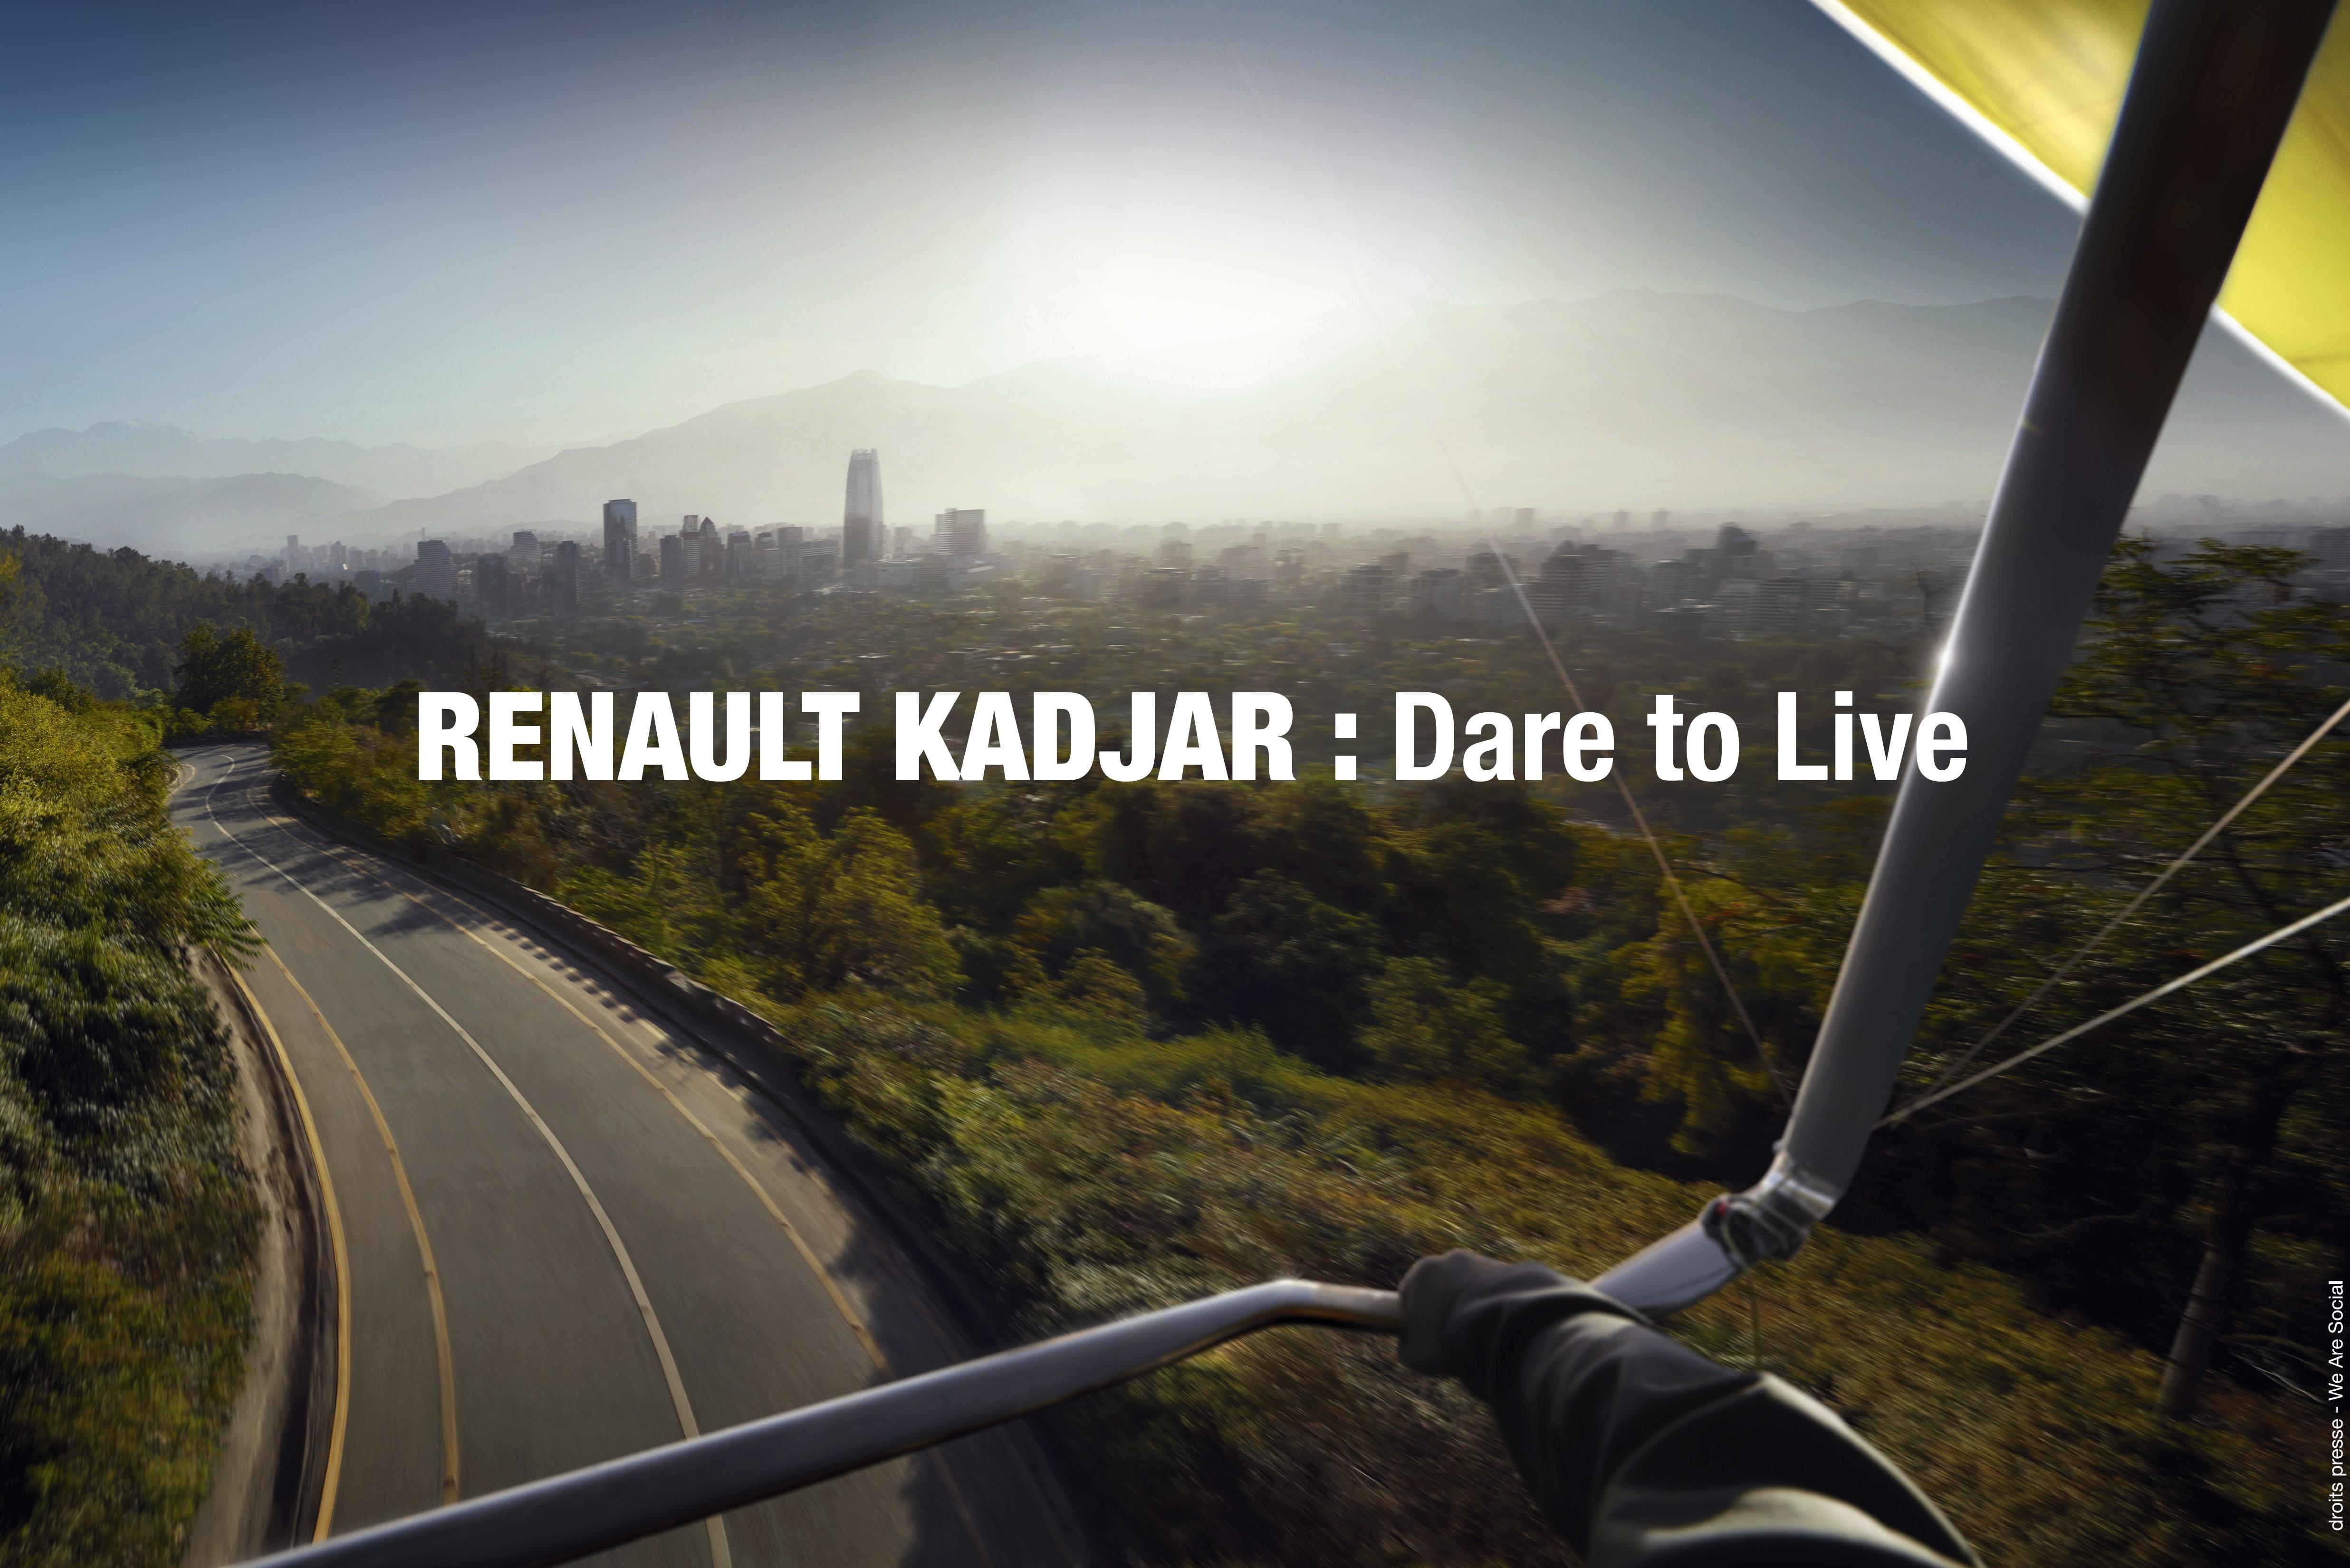 Renault KADJAR si svela sui social